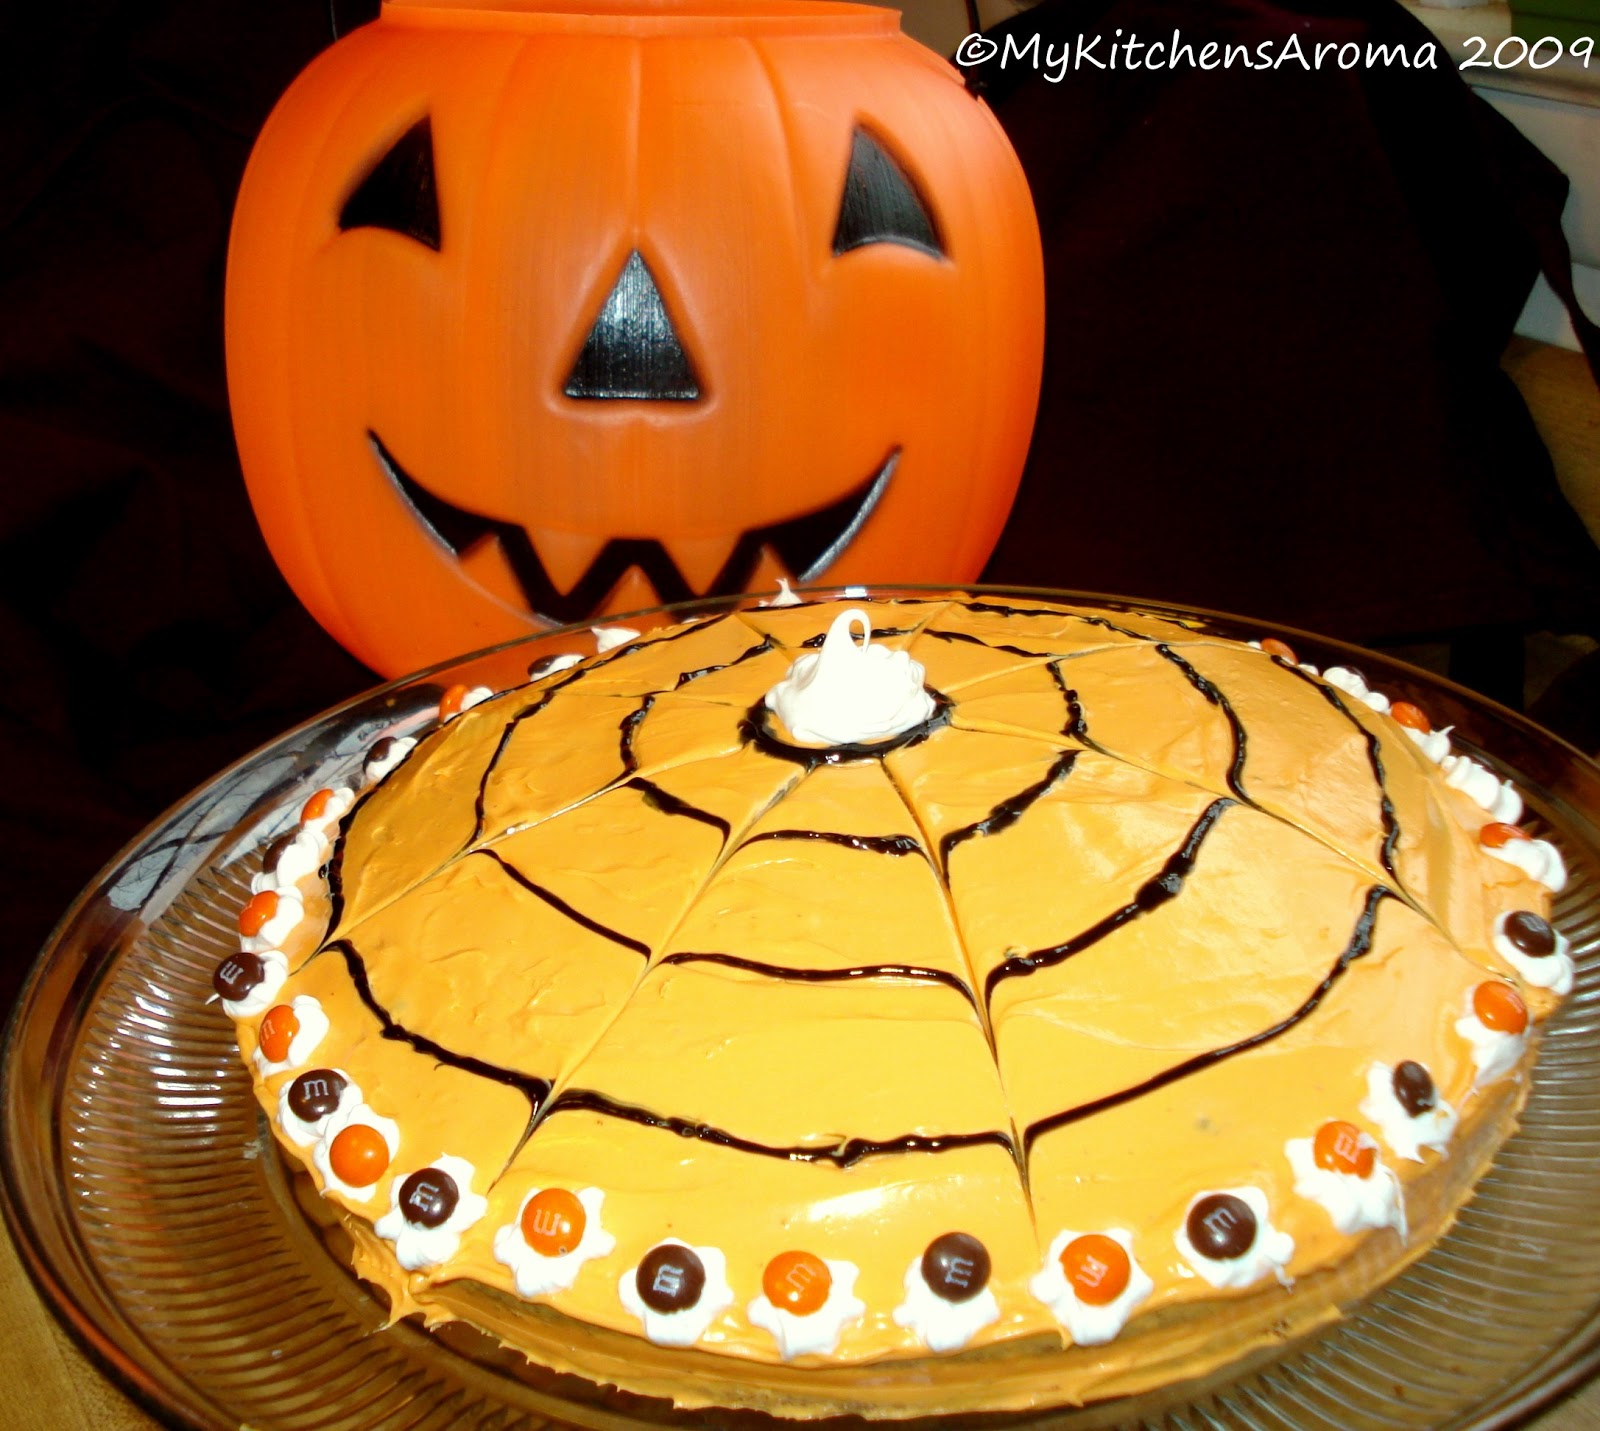 Pumpkin Shaped Cake Bundt Pan